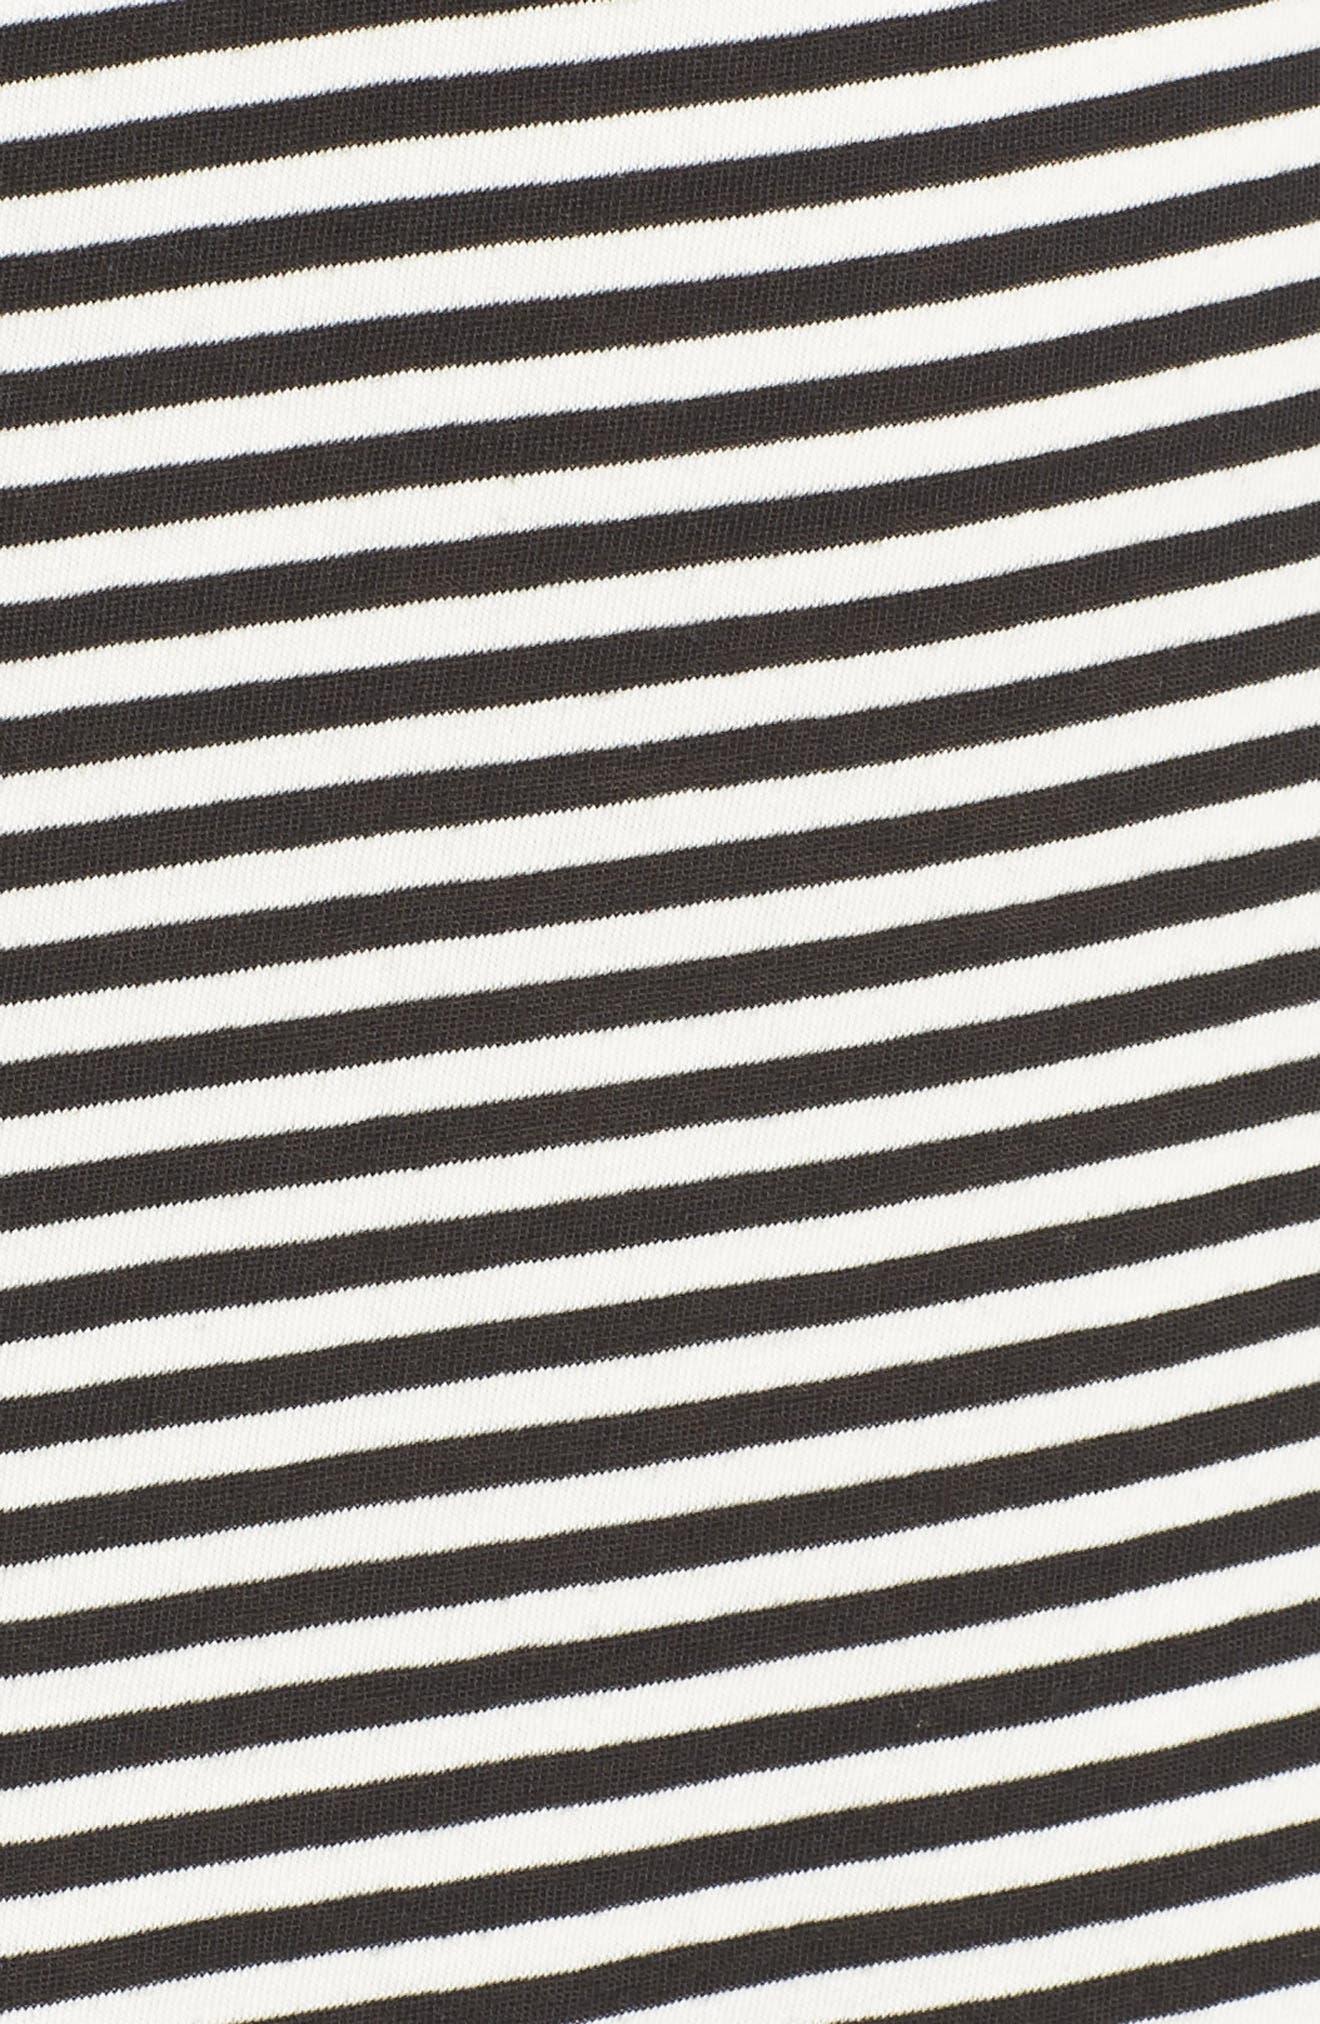 Boo Stripe High/Low Dress,                             Alternate thumbnail 6, color,                             Black Cat/ White Stripe